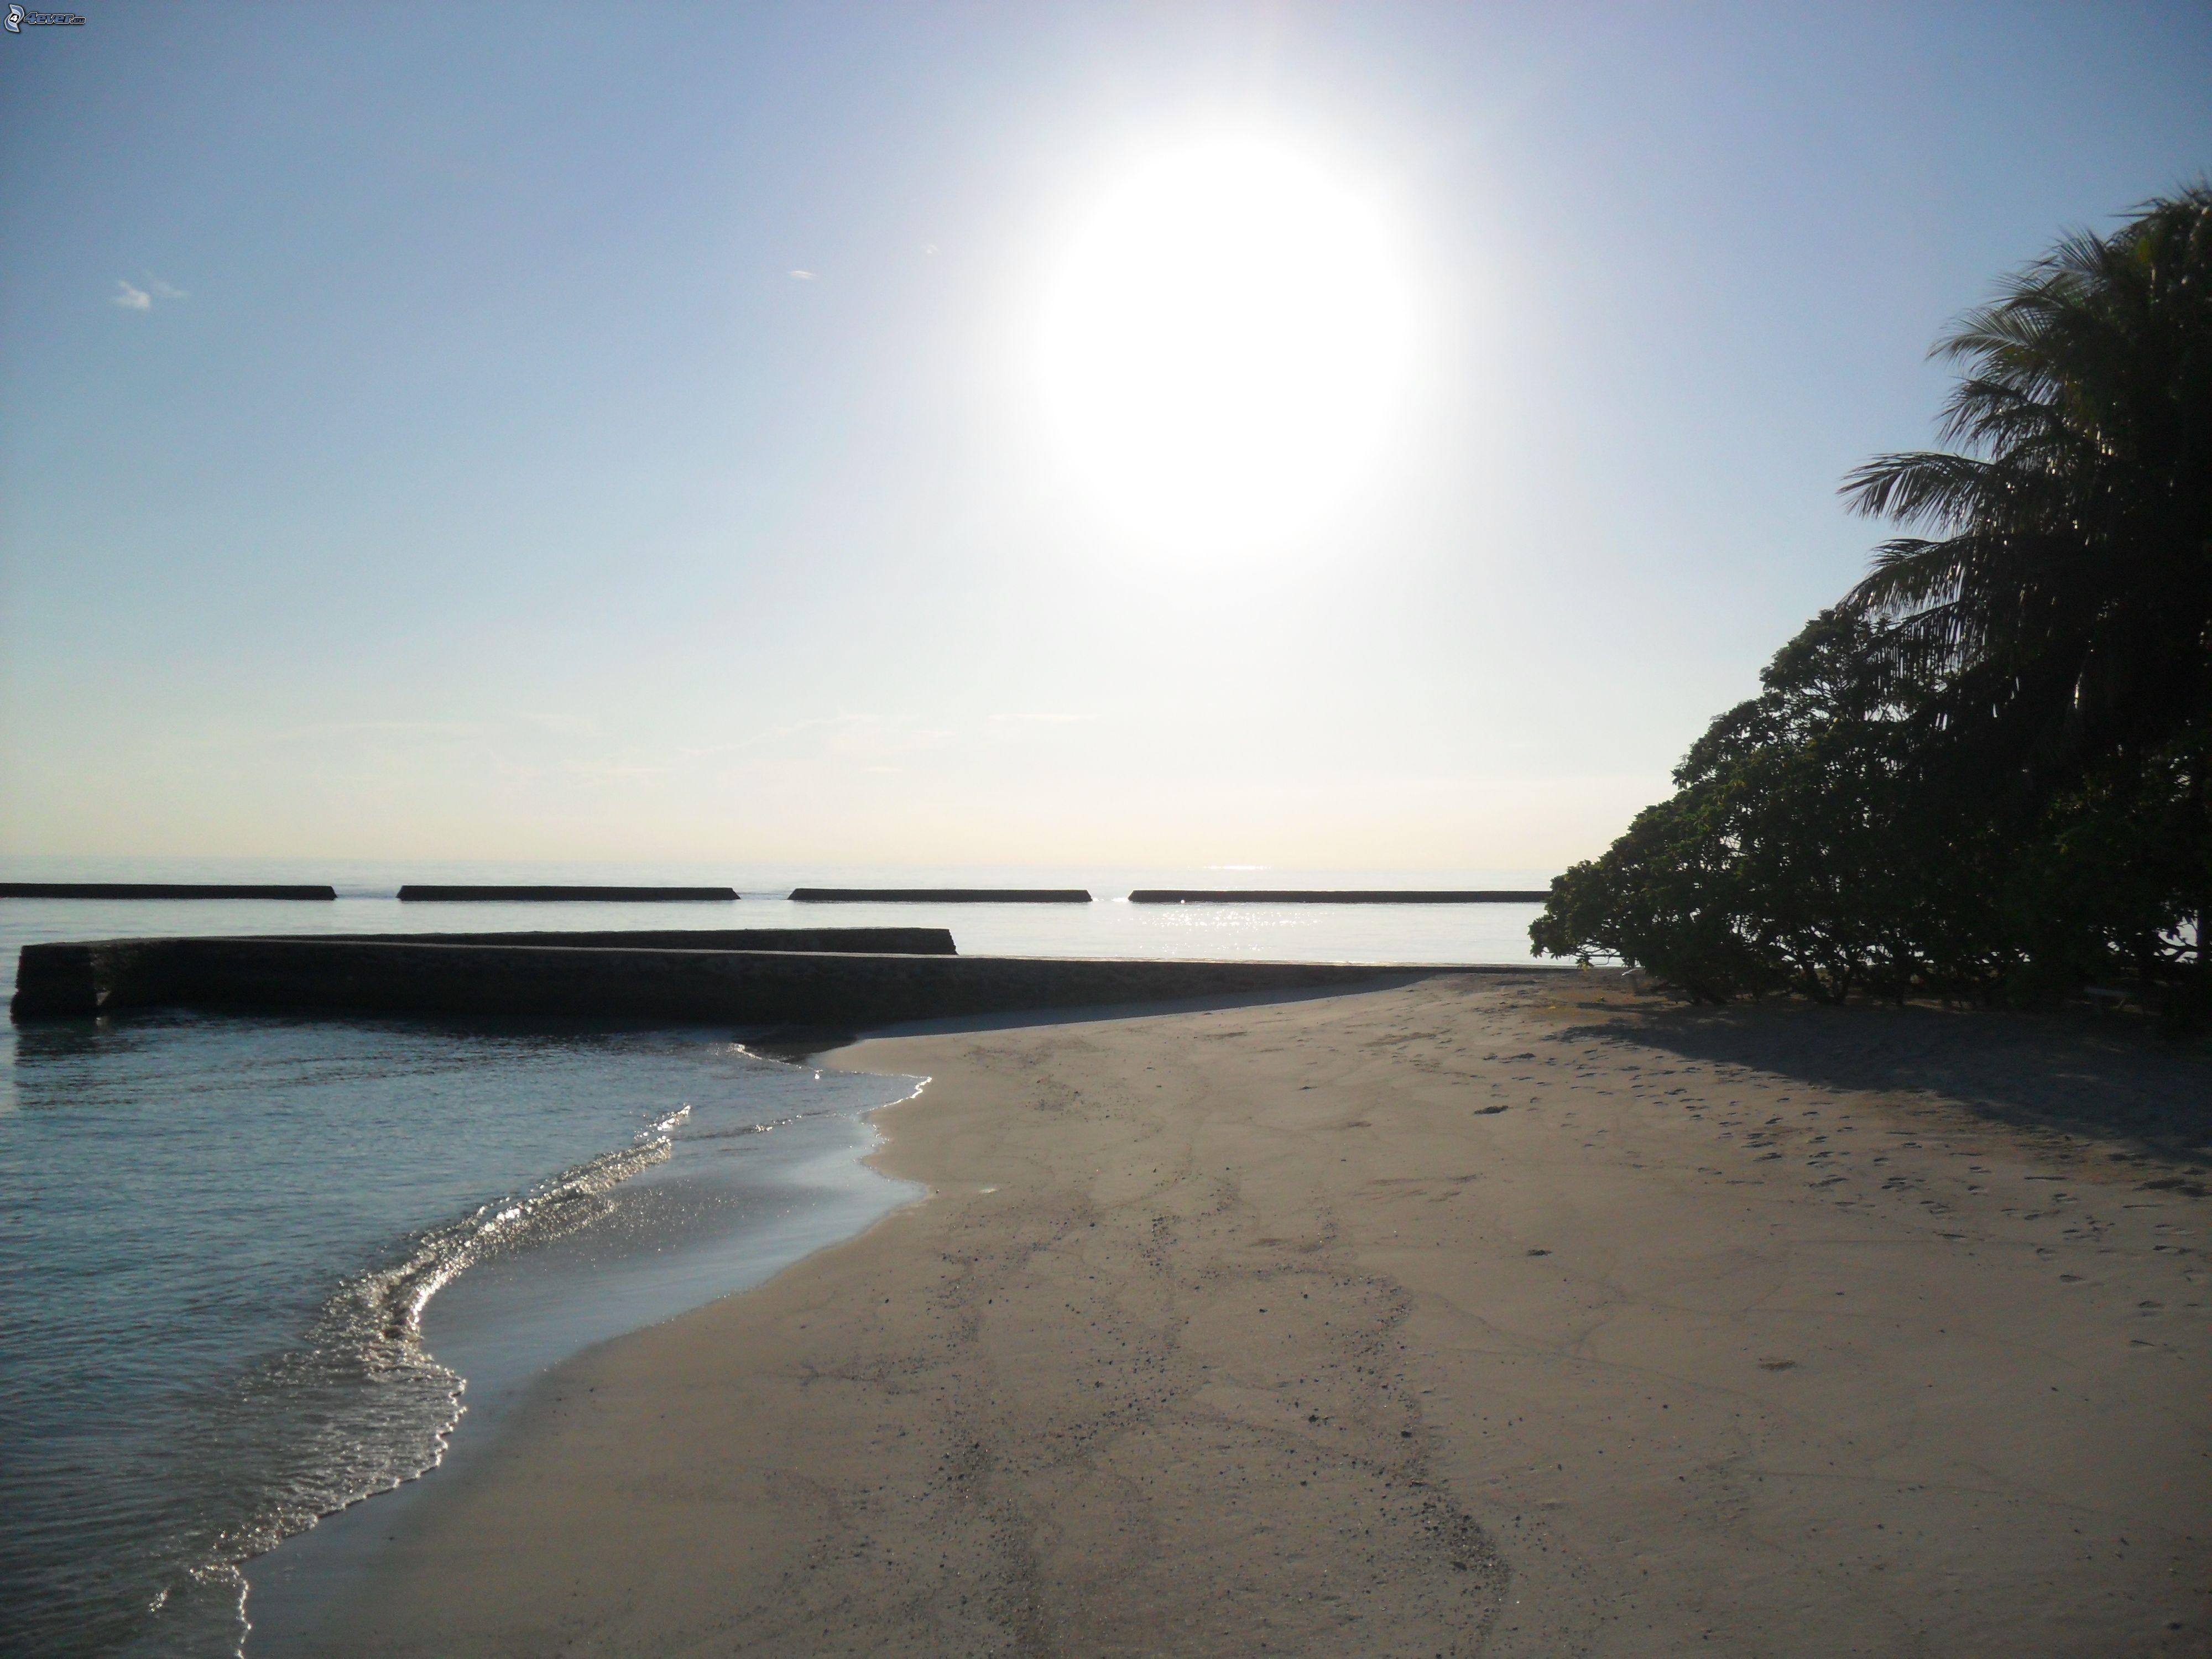 malediven tropisch meer strand - photo #48